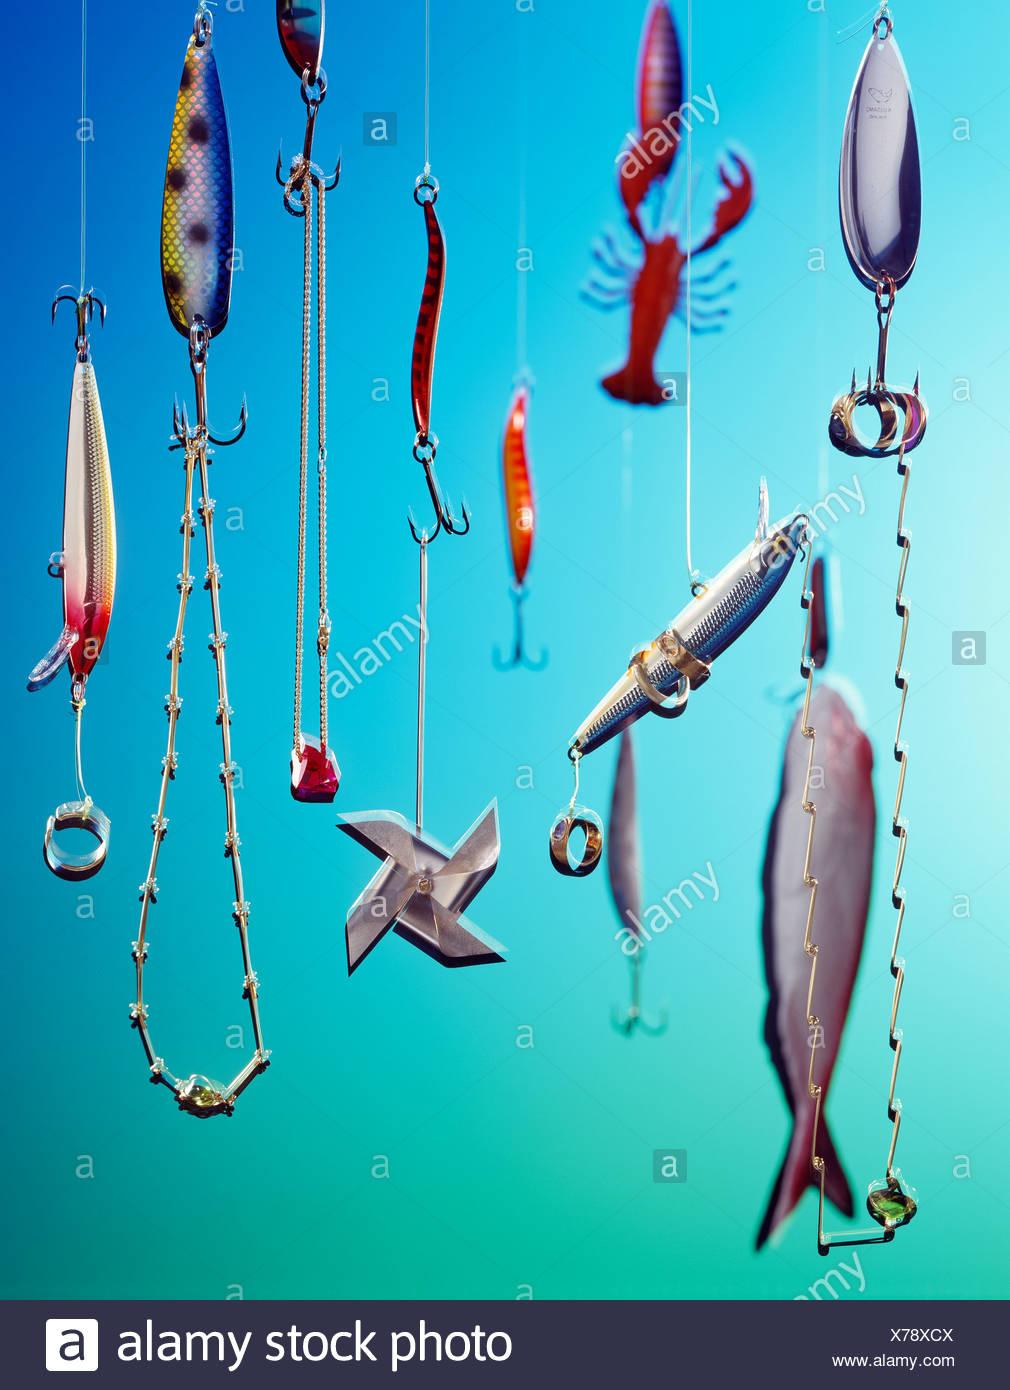 Jewelry on fish hooks, surreal - Stock Image